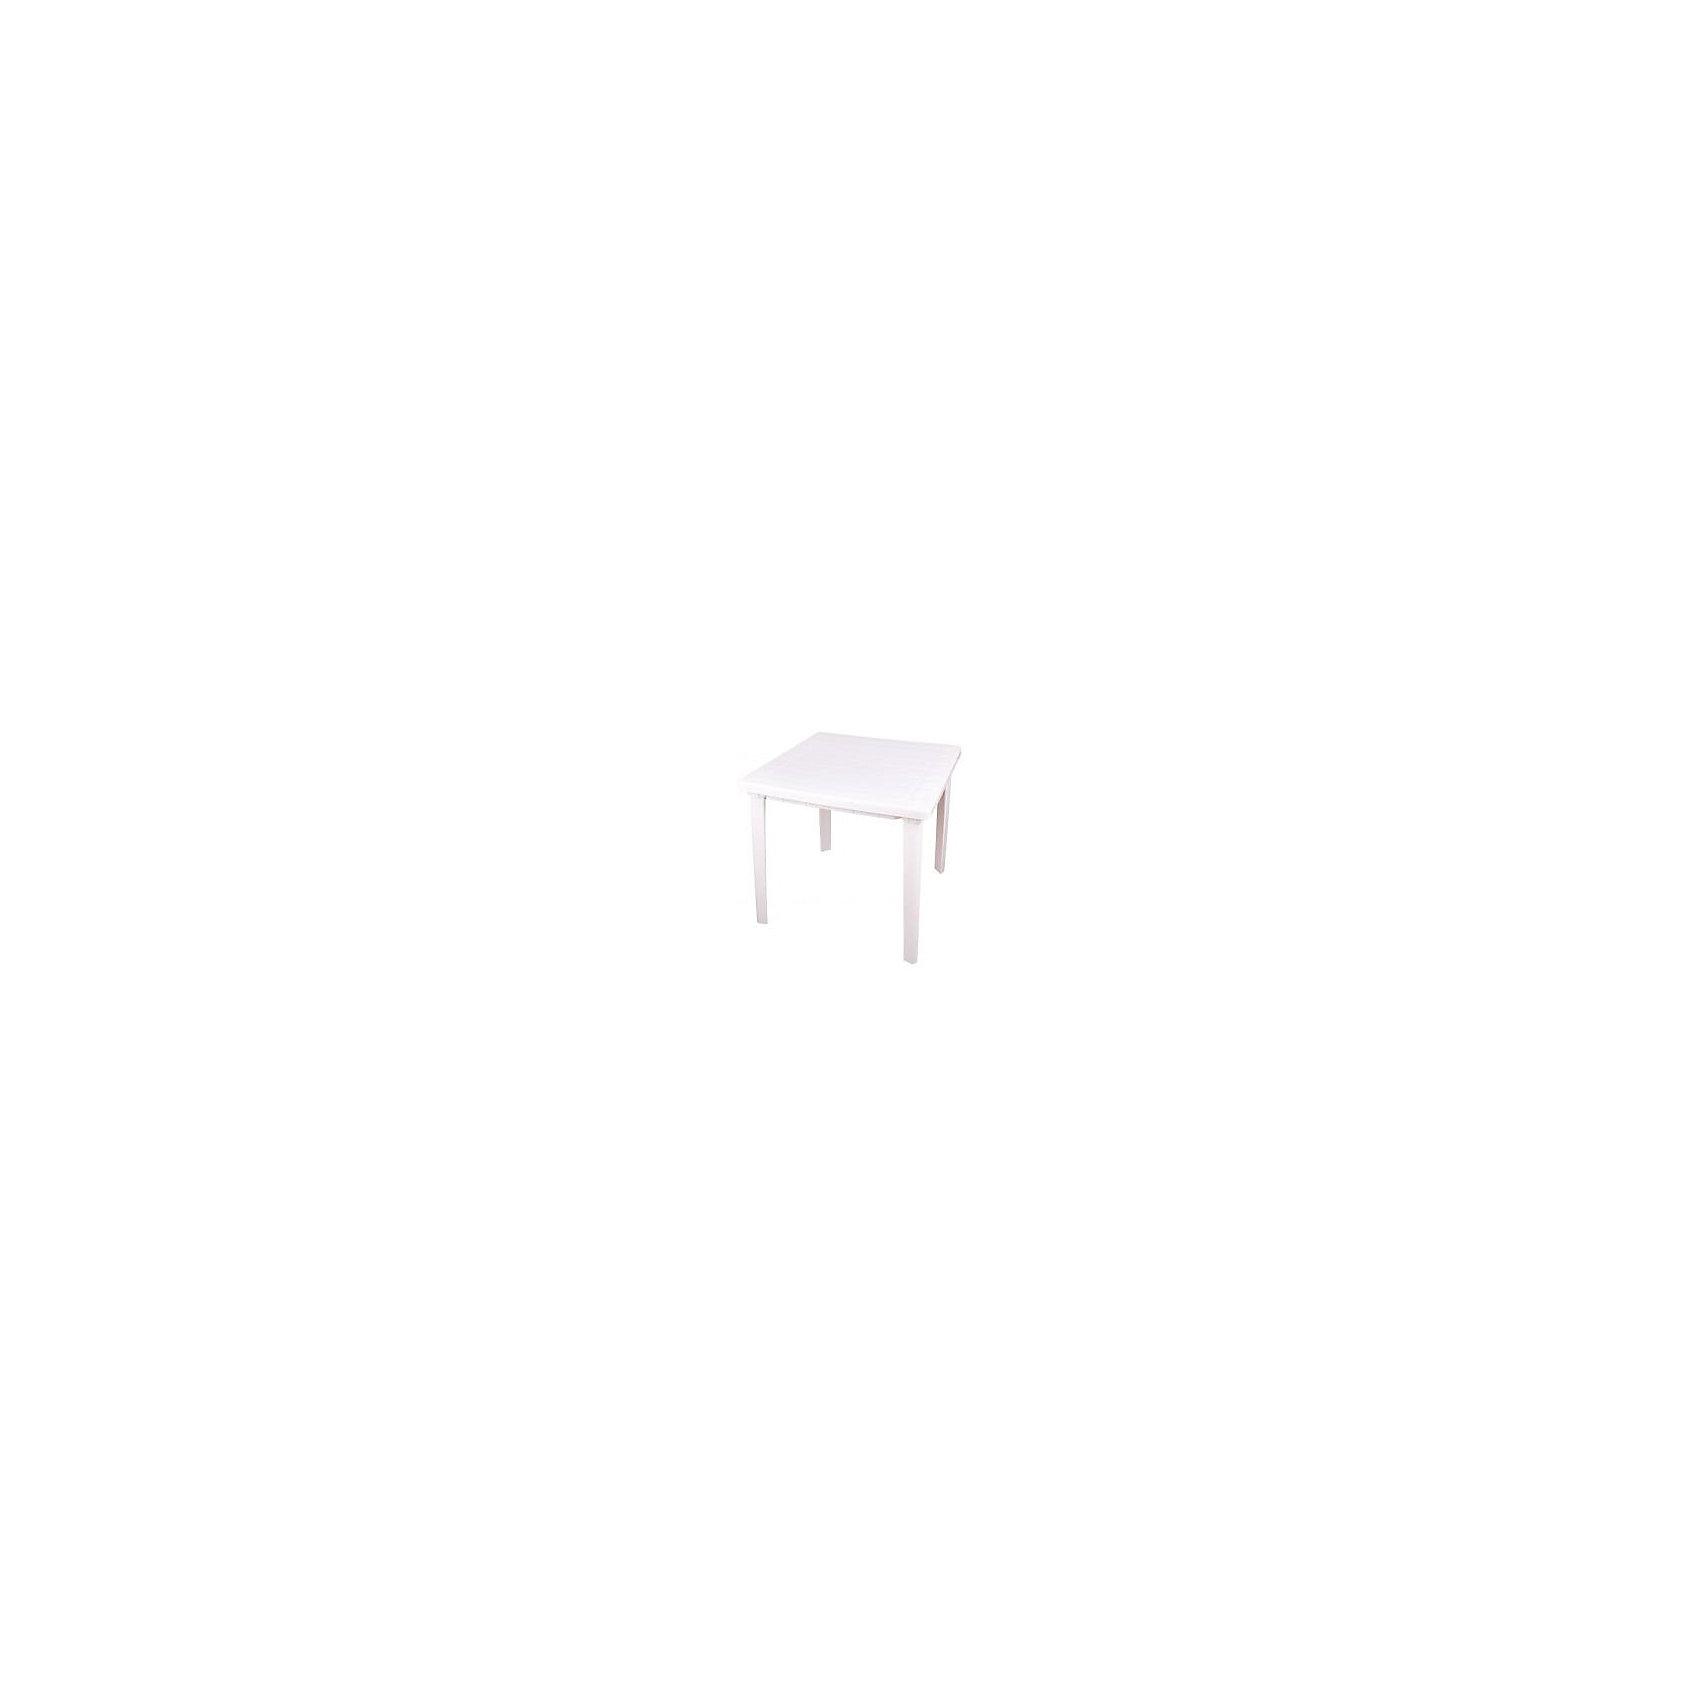 Стол квадратный 800х800х740, Alternativa, белый